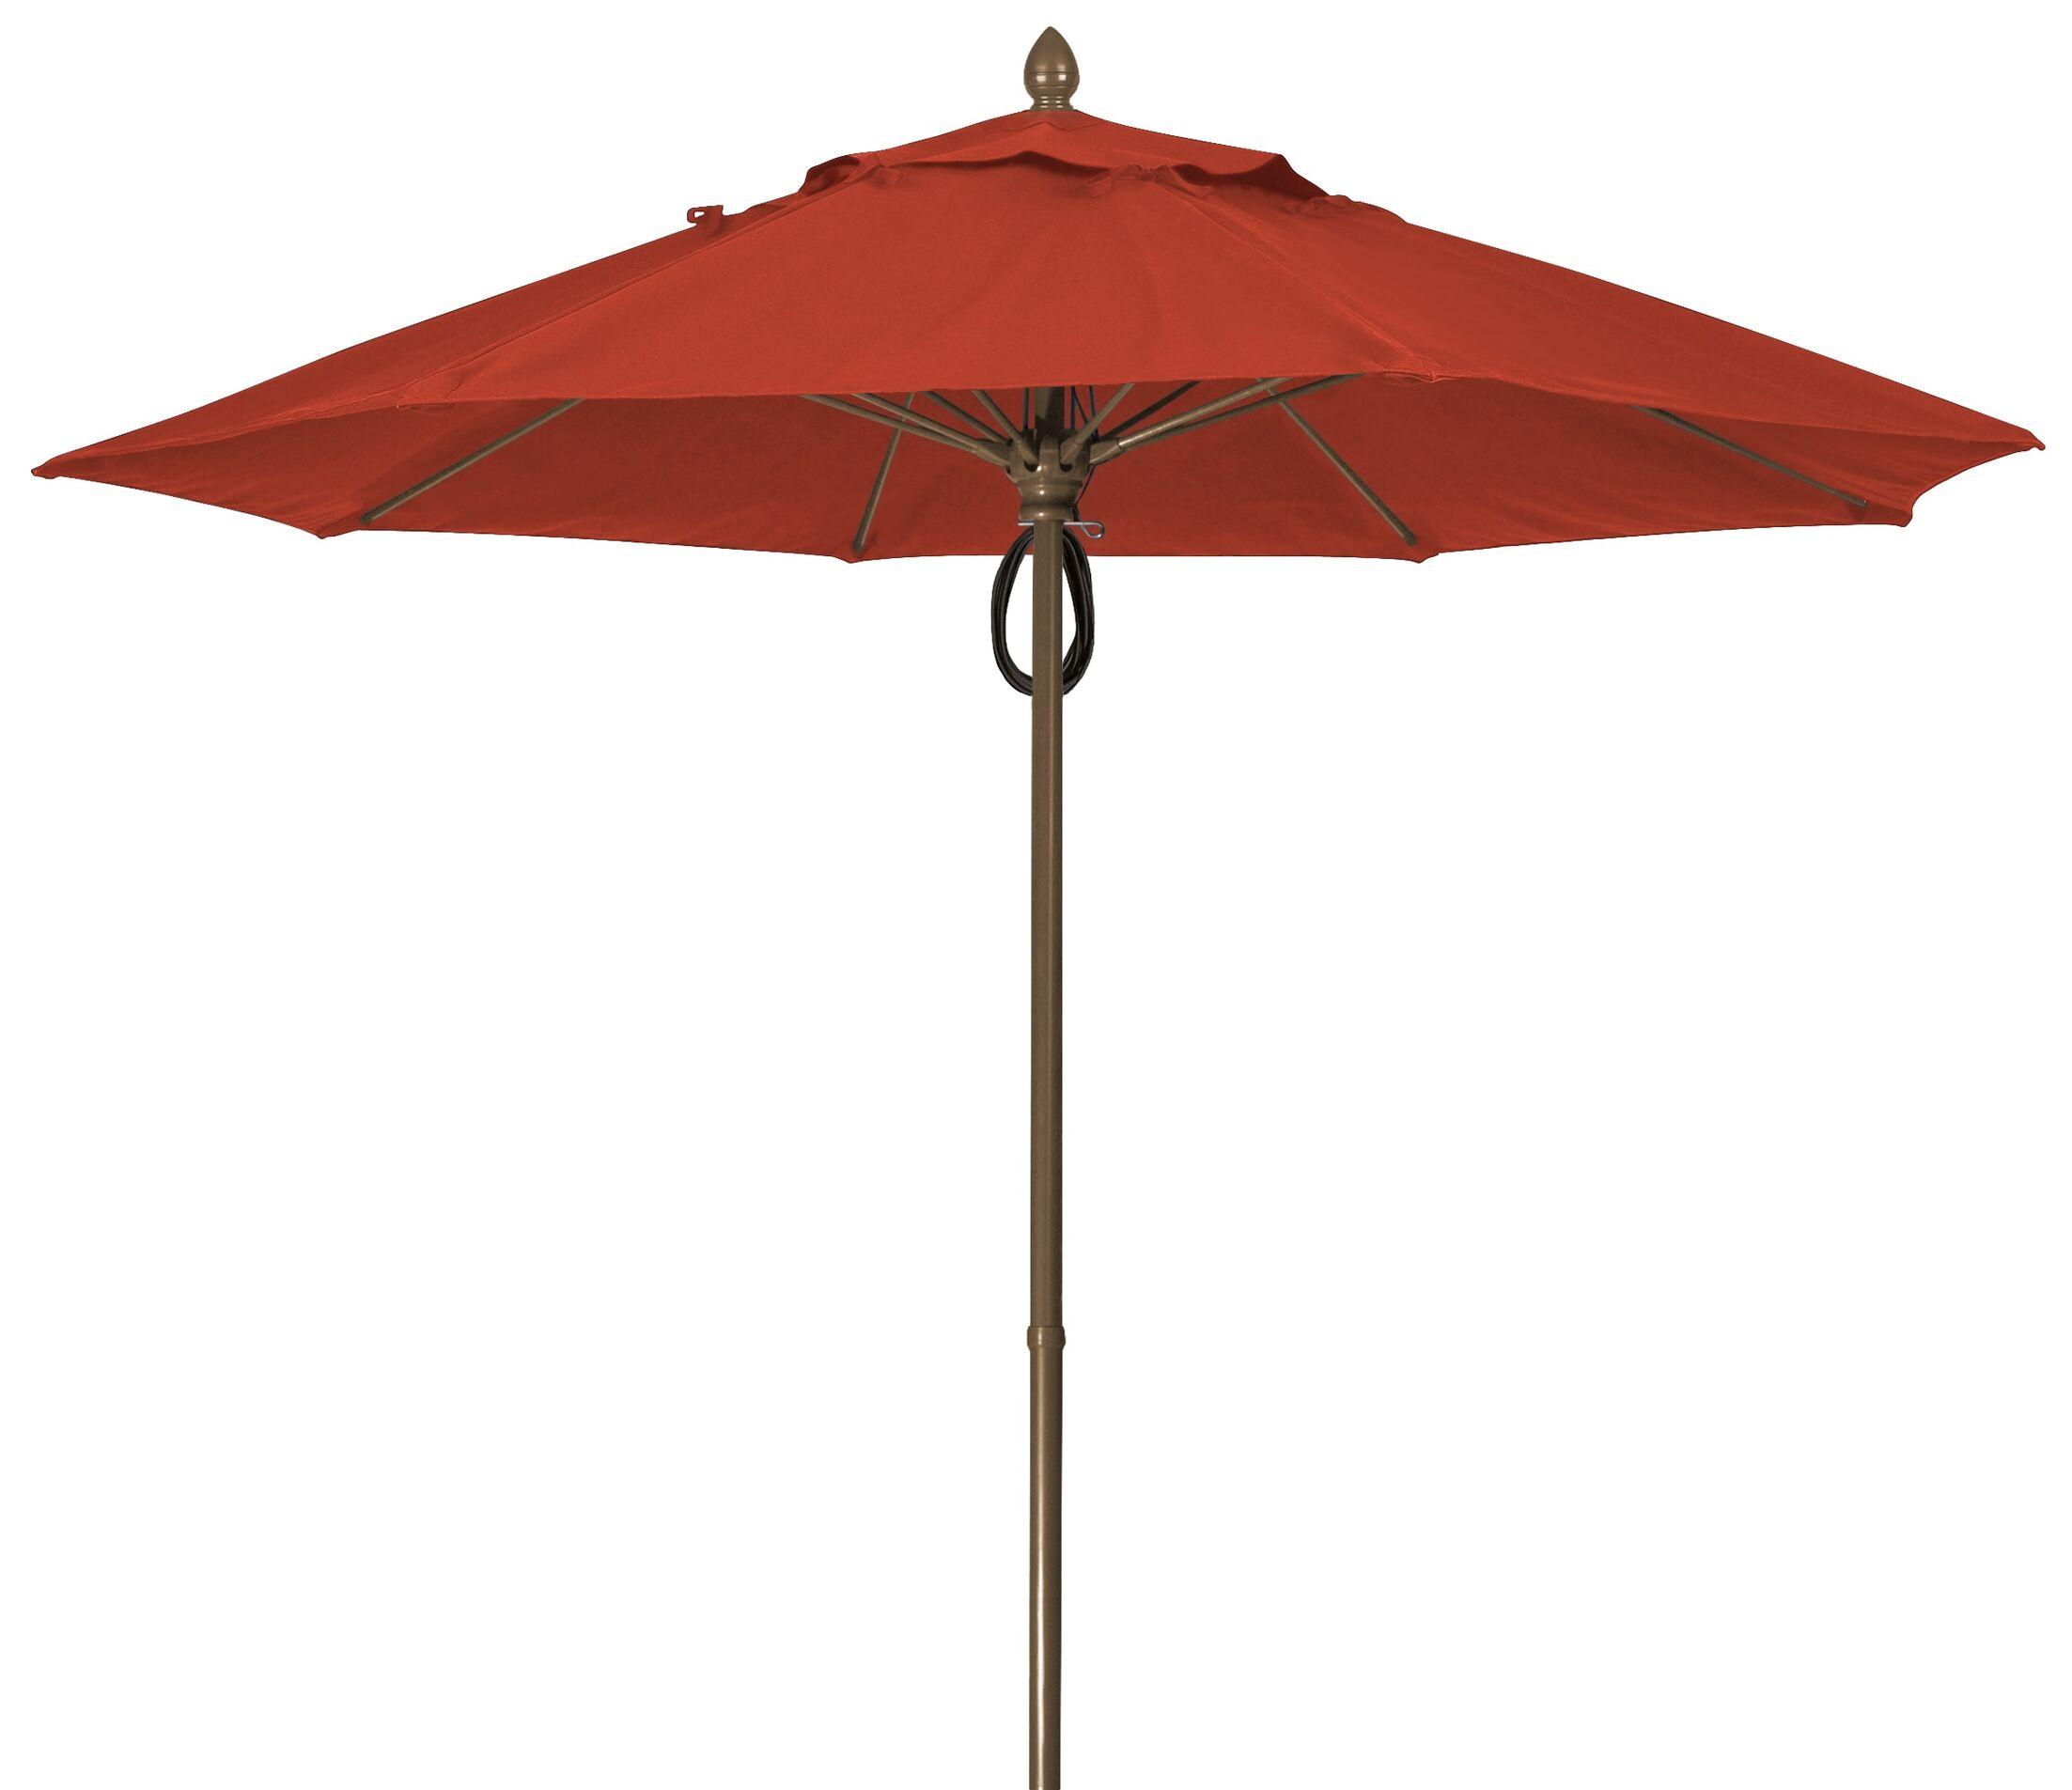 Prestige 9' Market Umbrella Frame Finish: Champagne Bronze, Fabric: Terracotta